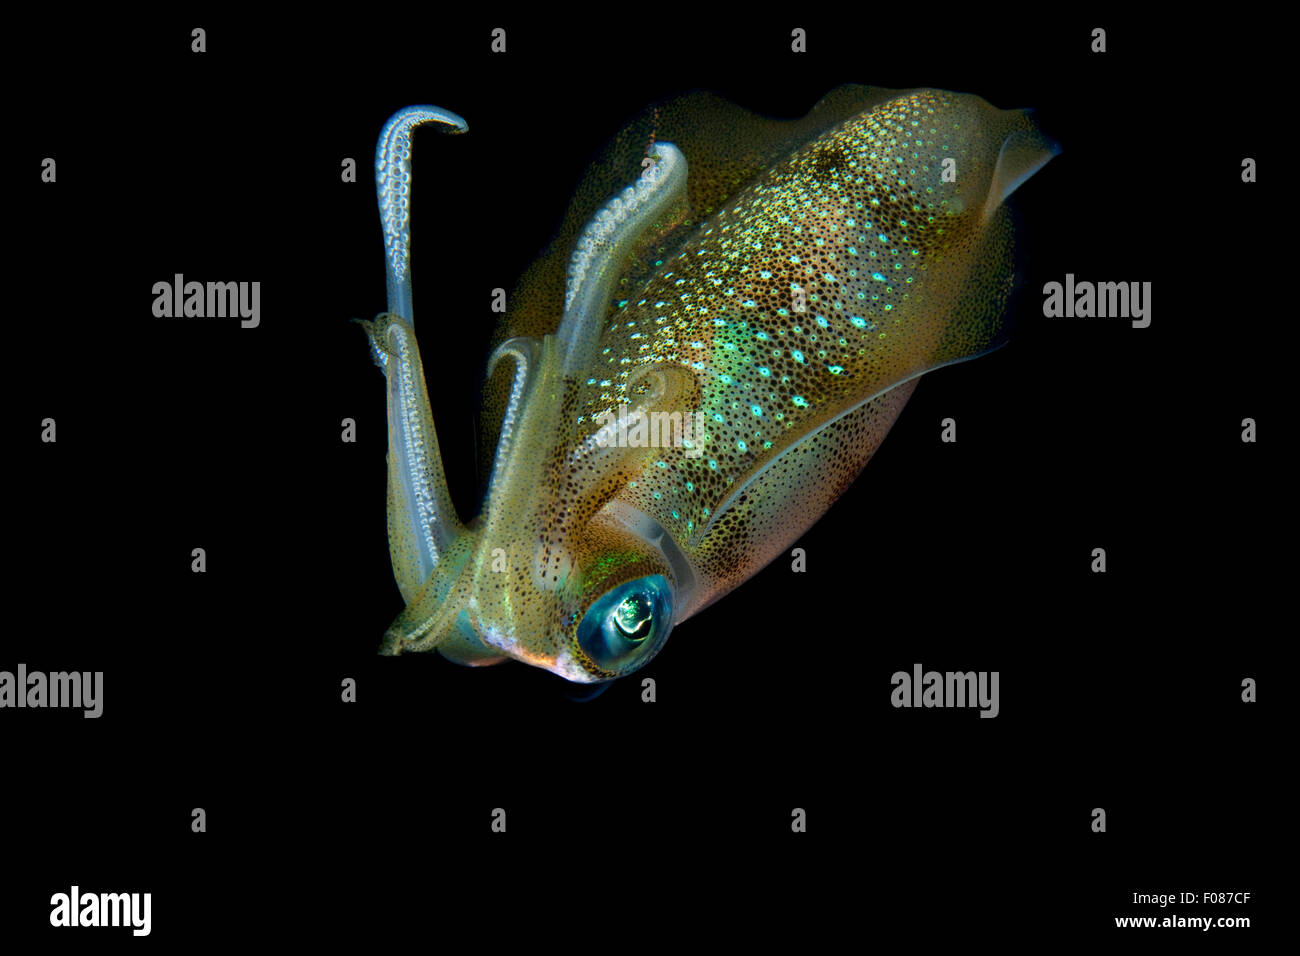 Big Reef Squid at Night, Sepioteuthis lessoniana, Ari Atoll, Maldives - Stock Image